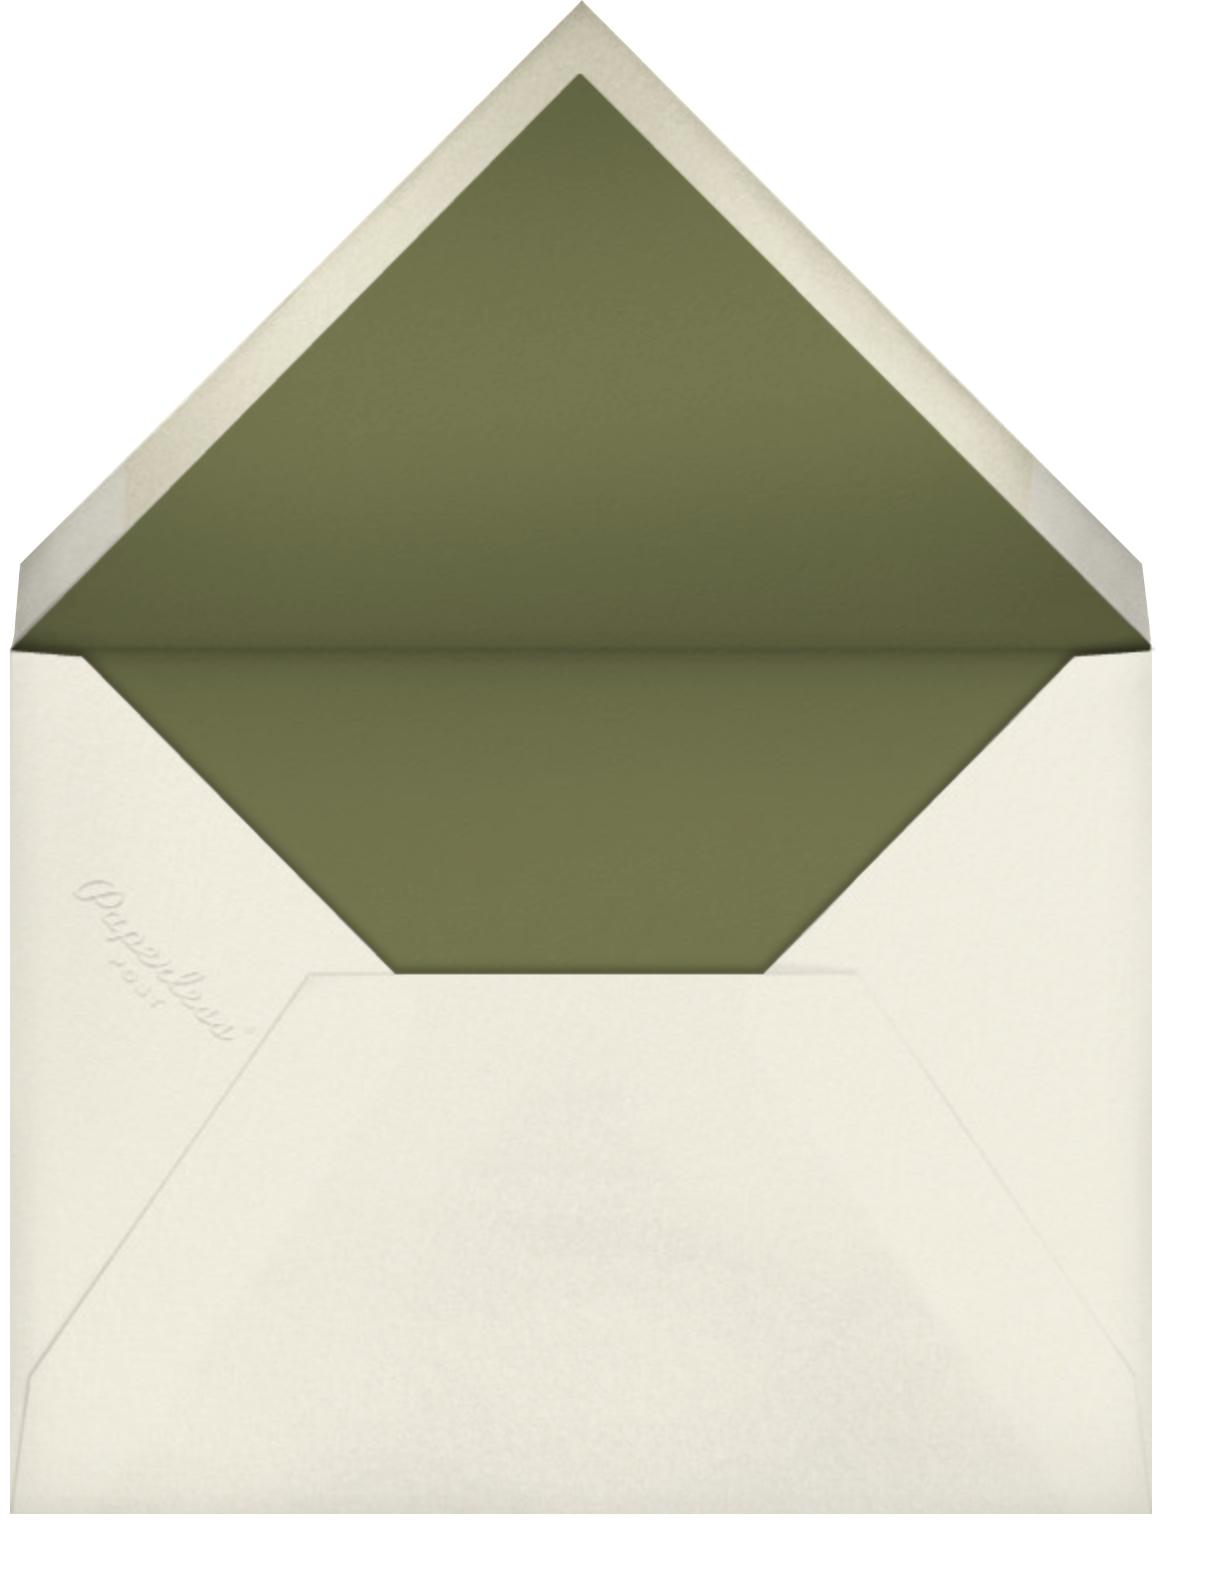 Stamped - Flame - Oscar de la Renta - Farewell party - envelope back